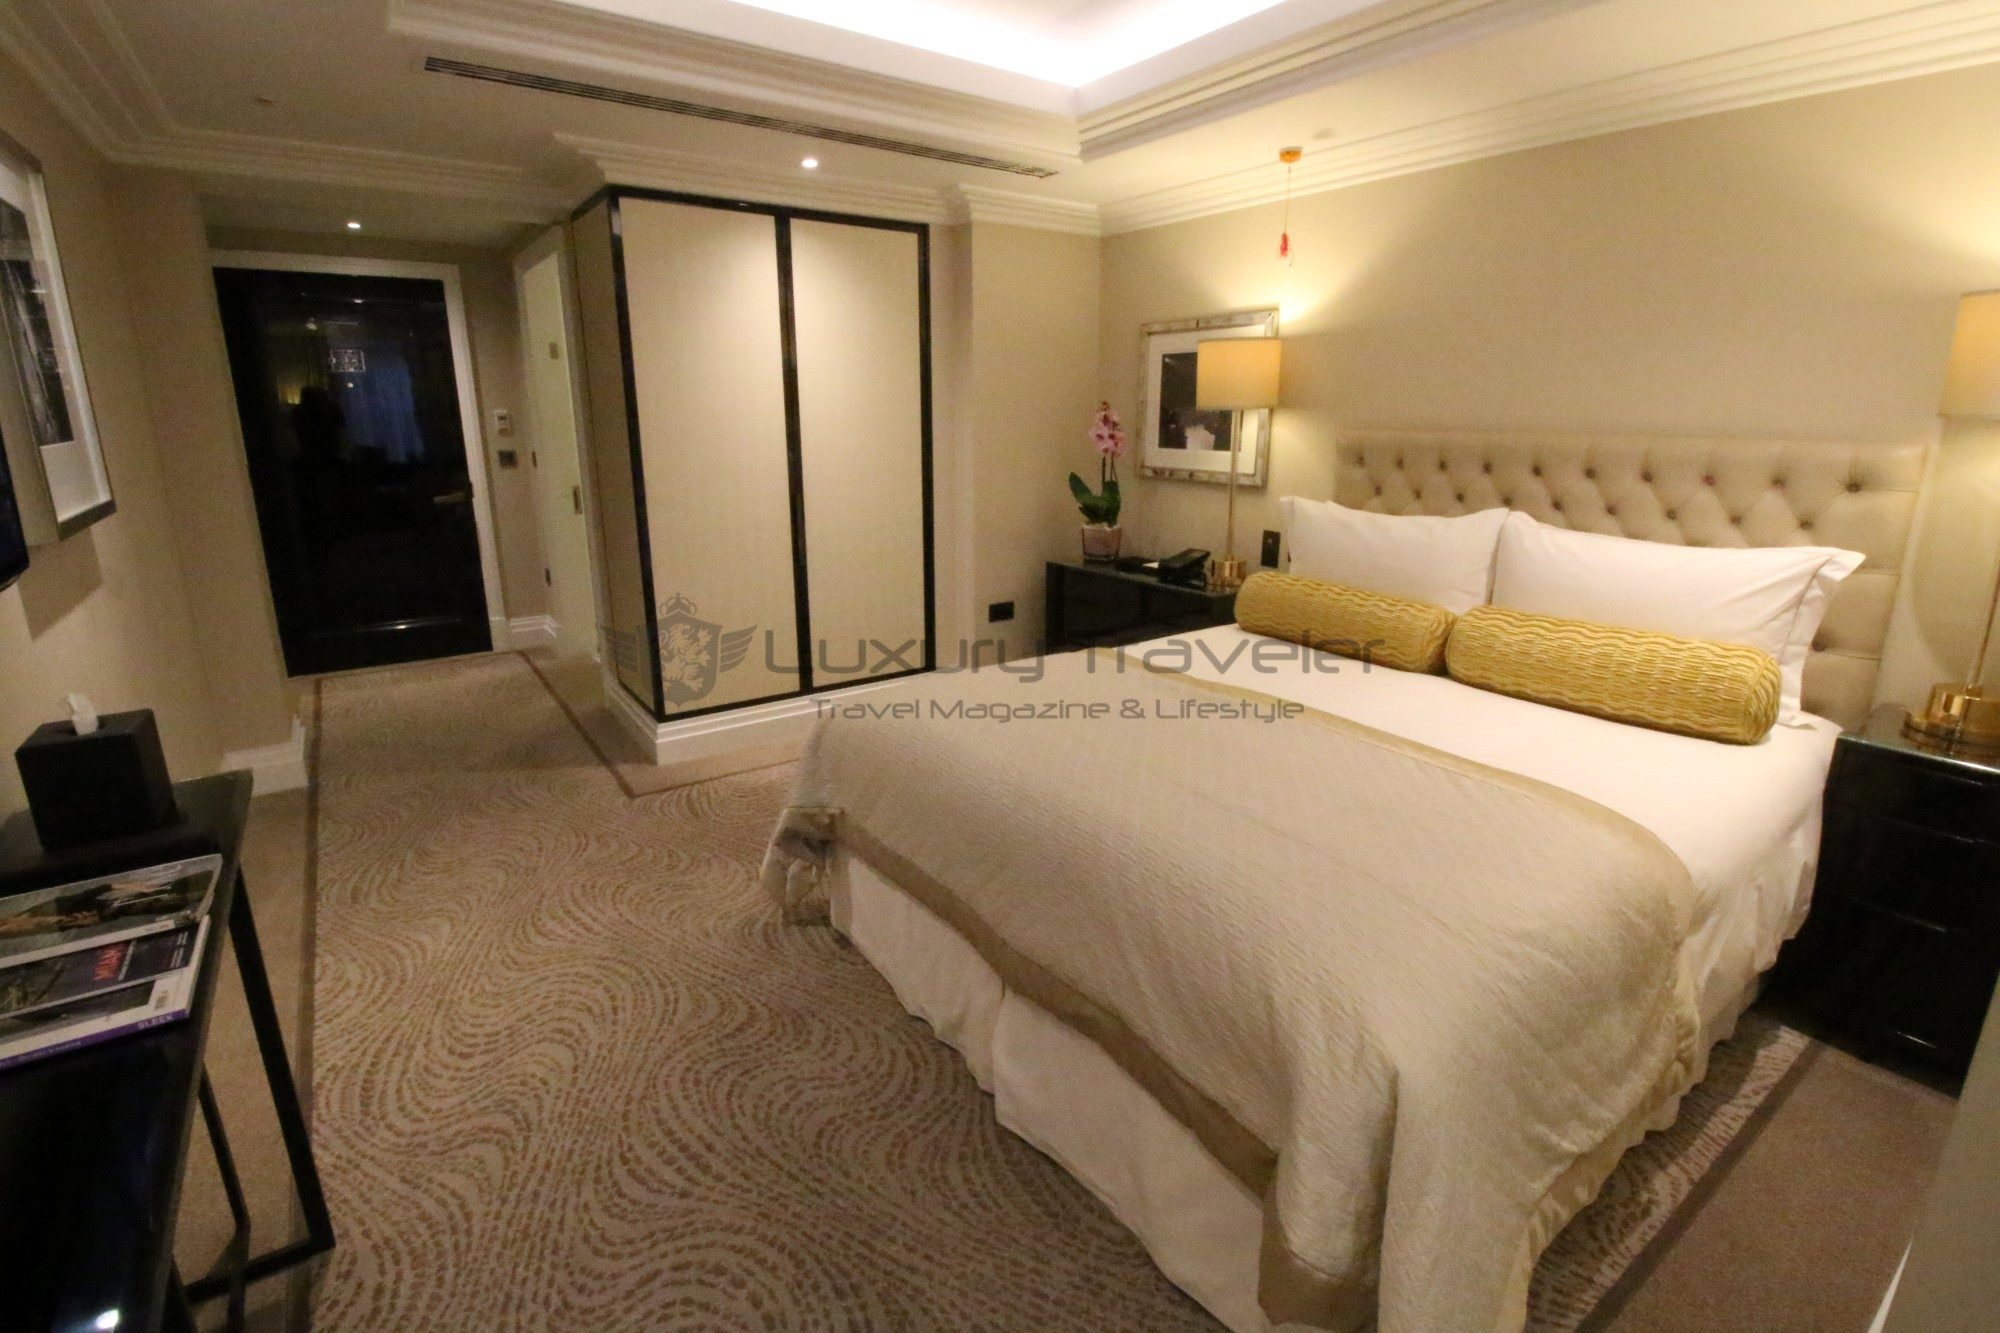 17-the_wellesley_hotel_london_uk_luxury_rooms